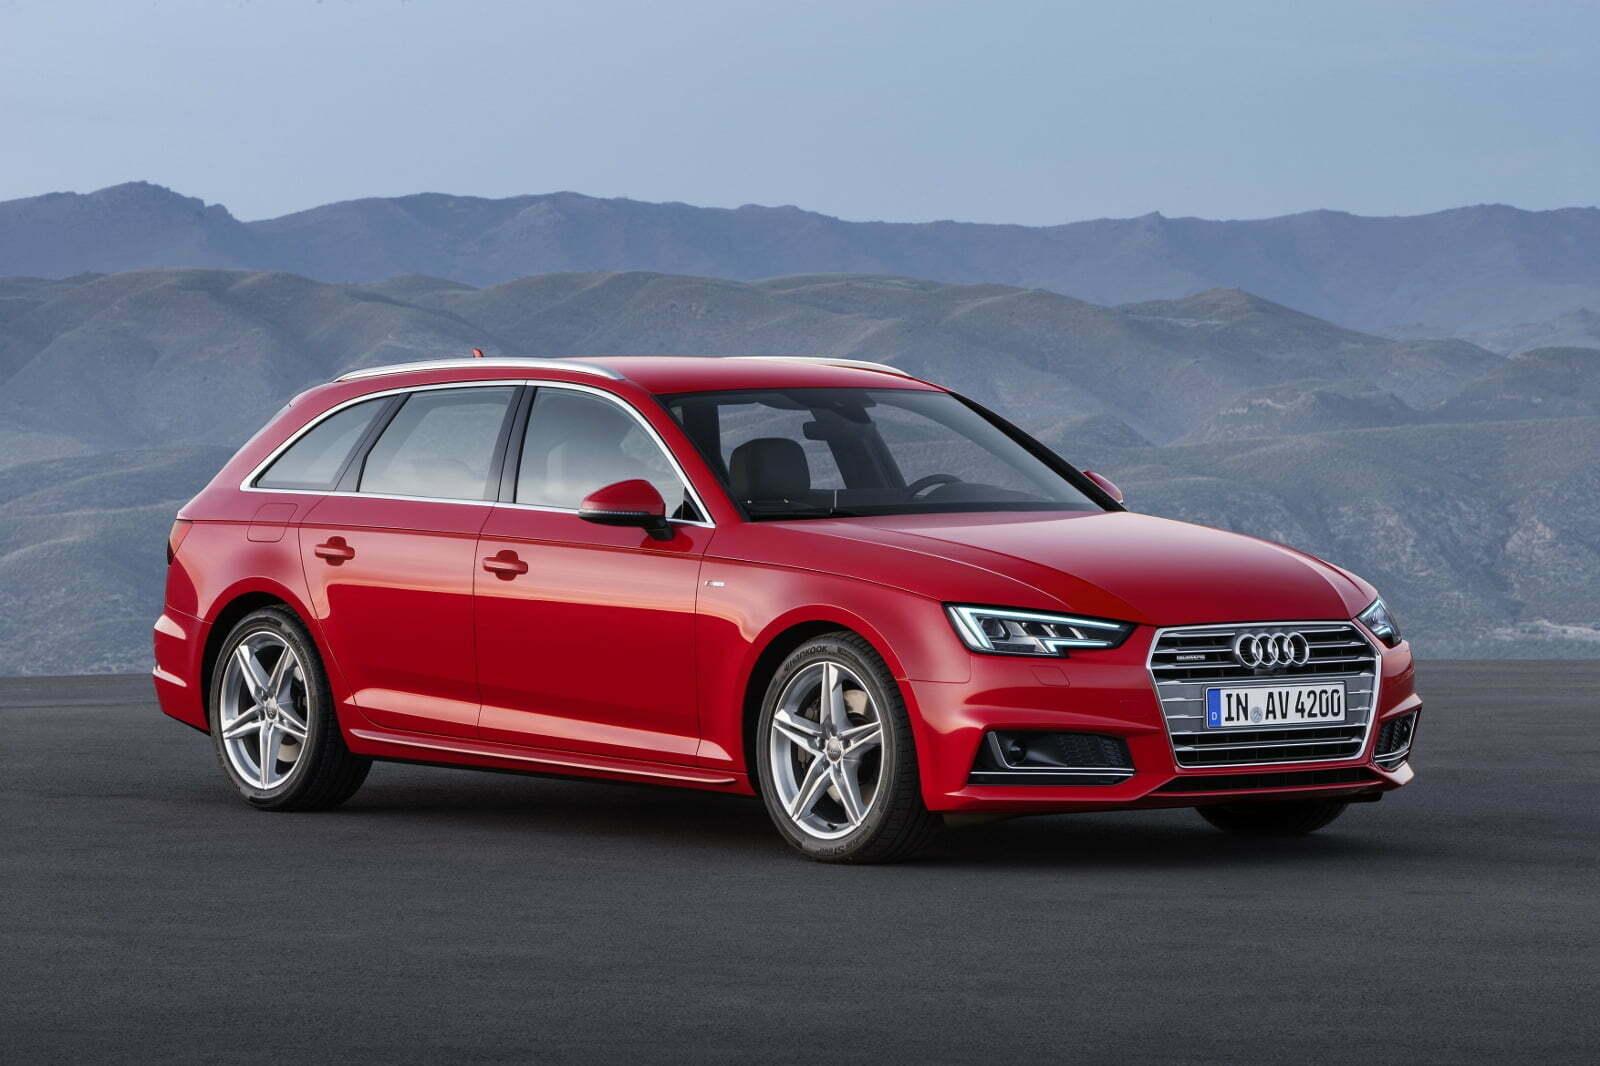 Audi A4 Avant 2019 Lease Edition Audi Cars Review Release Raiacarscom